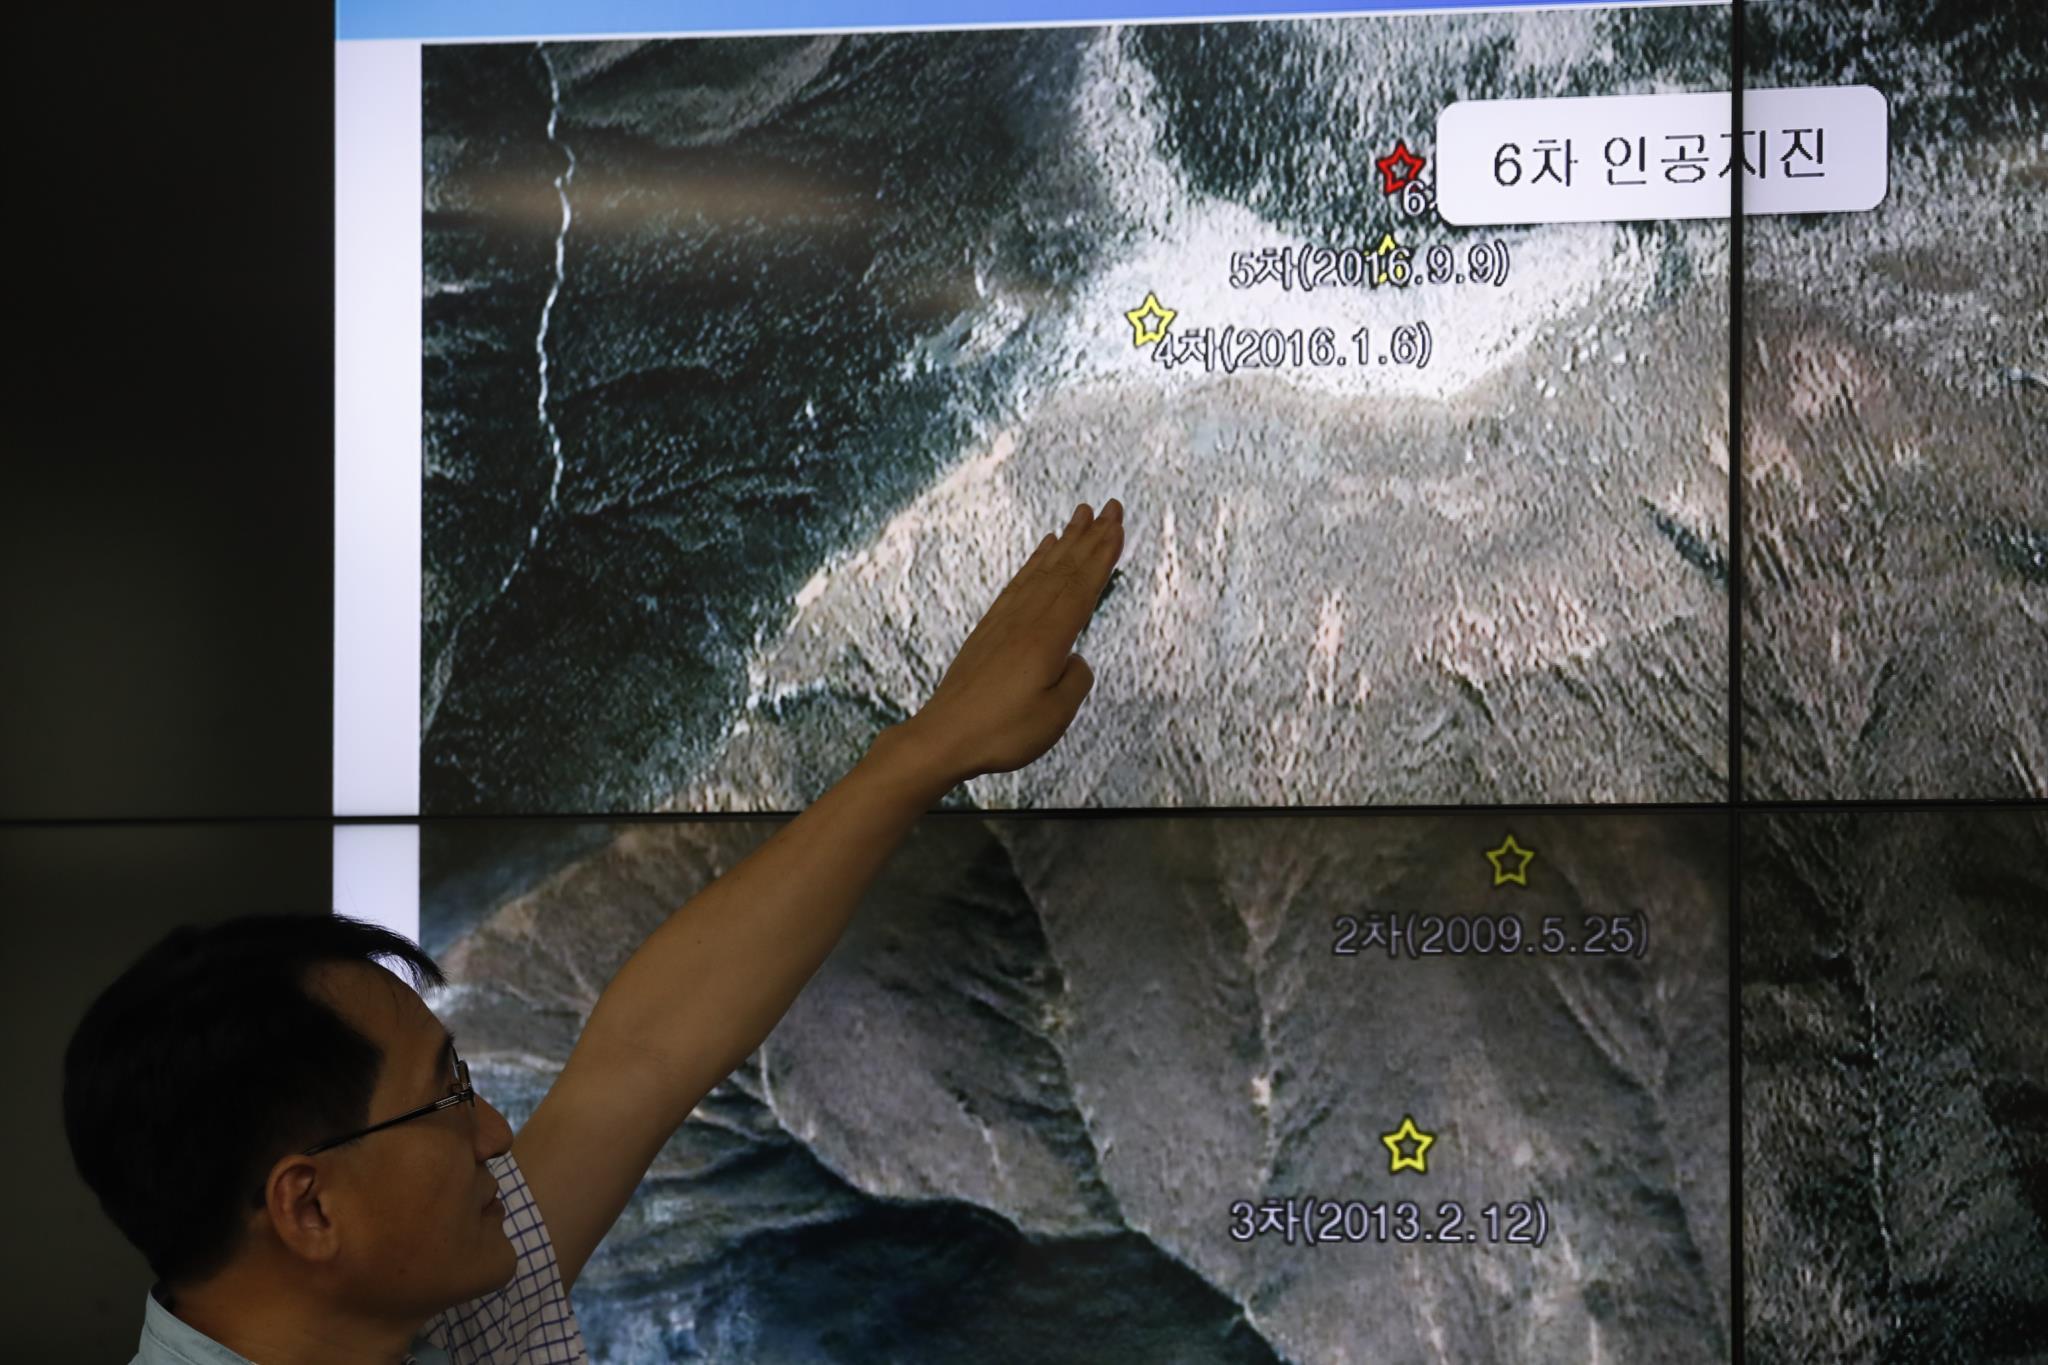 O teste foi realizado no nordeste da Coreia do Sul